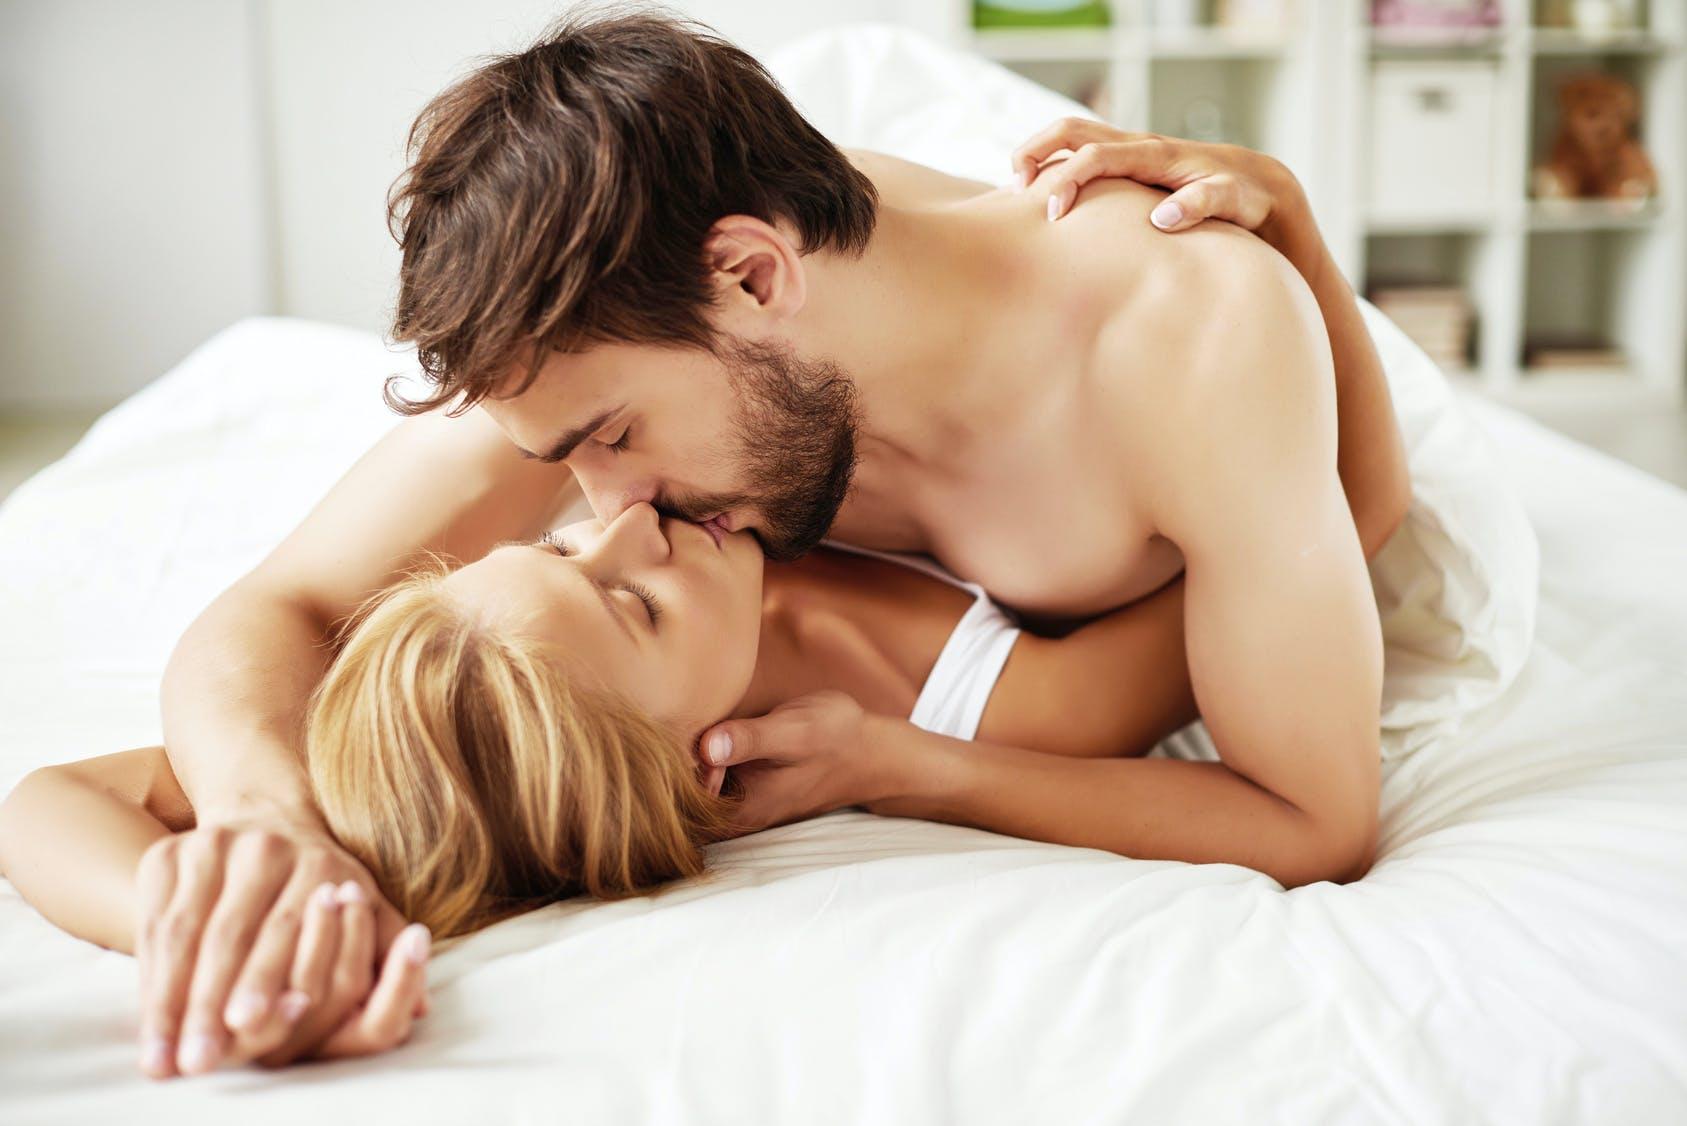 sexe fille parfaite le sexe de stockage